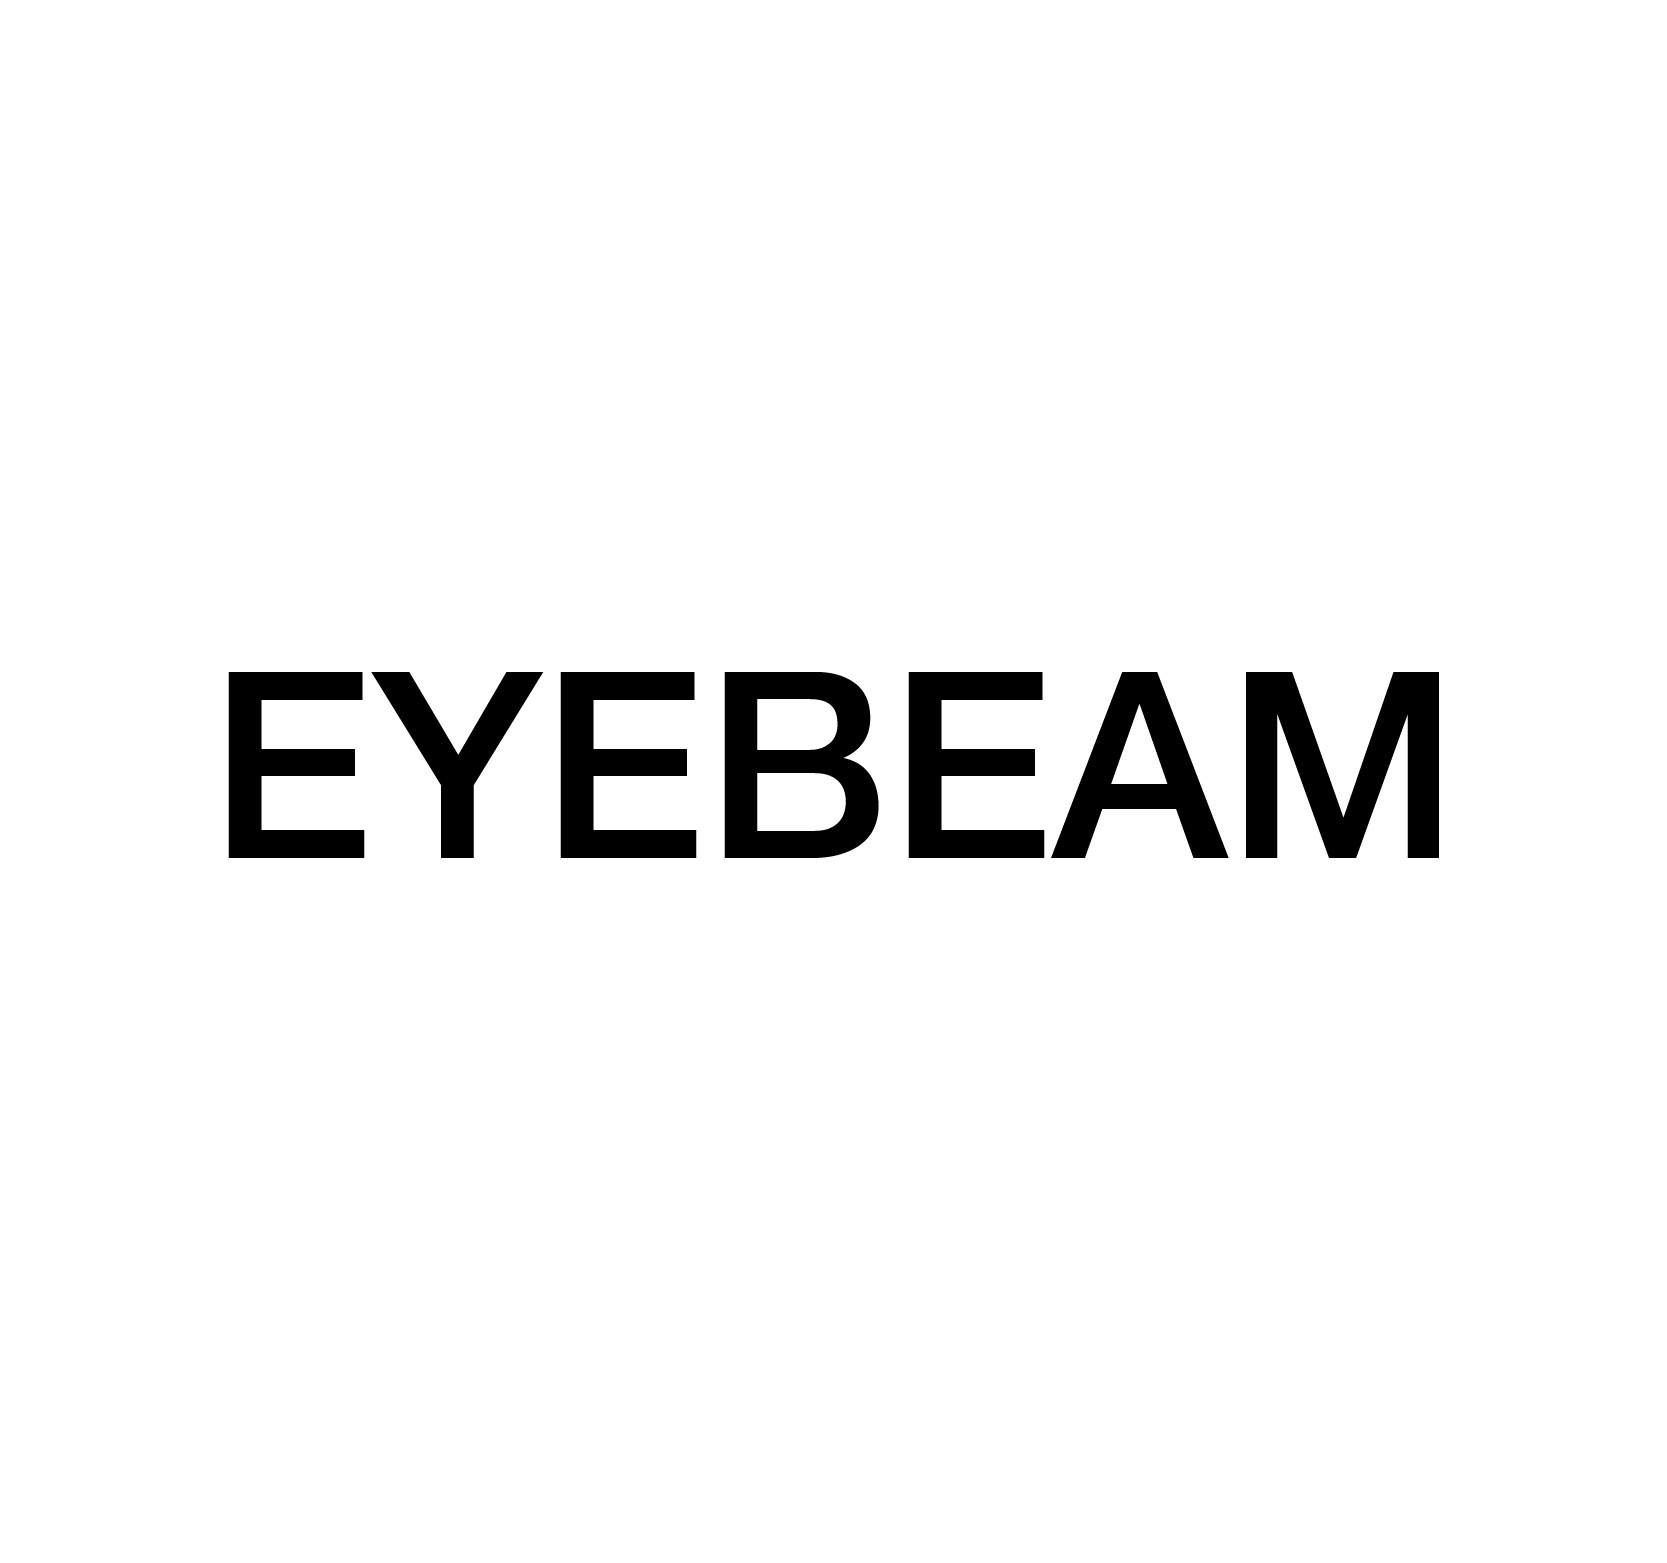 Eyebeam.jpg